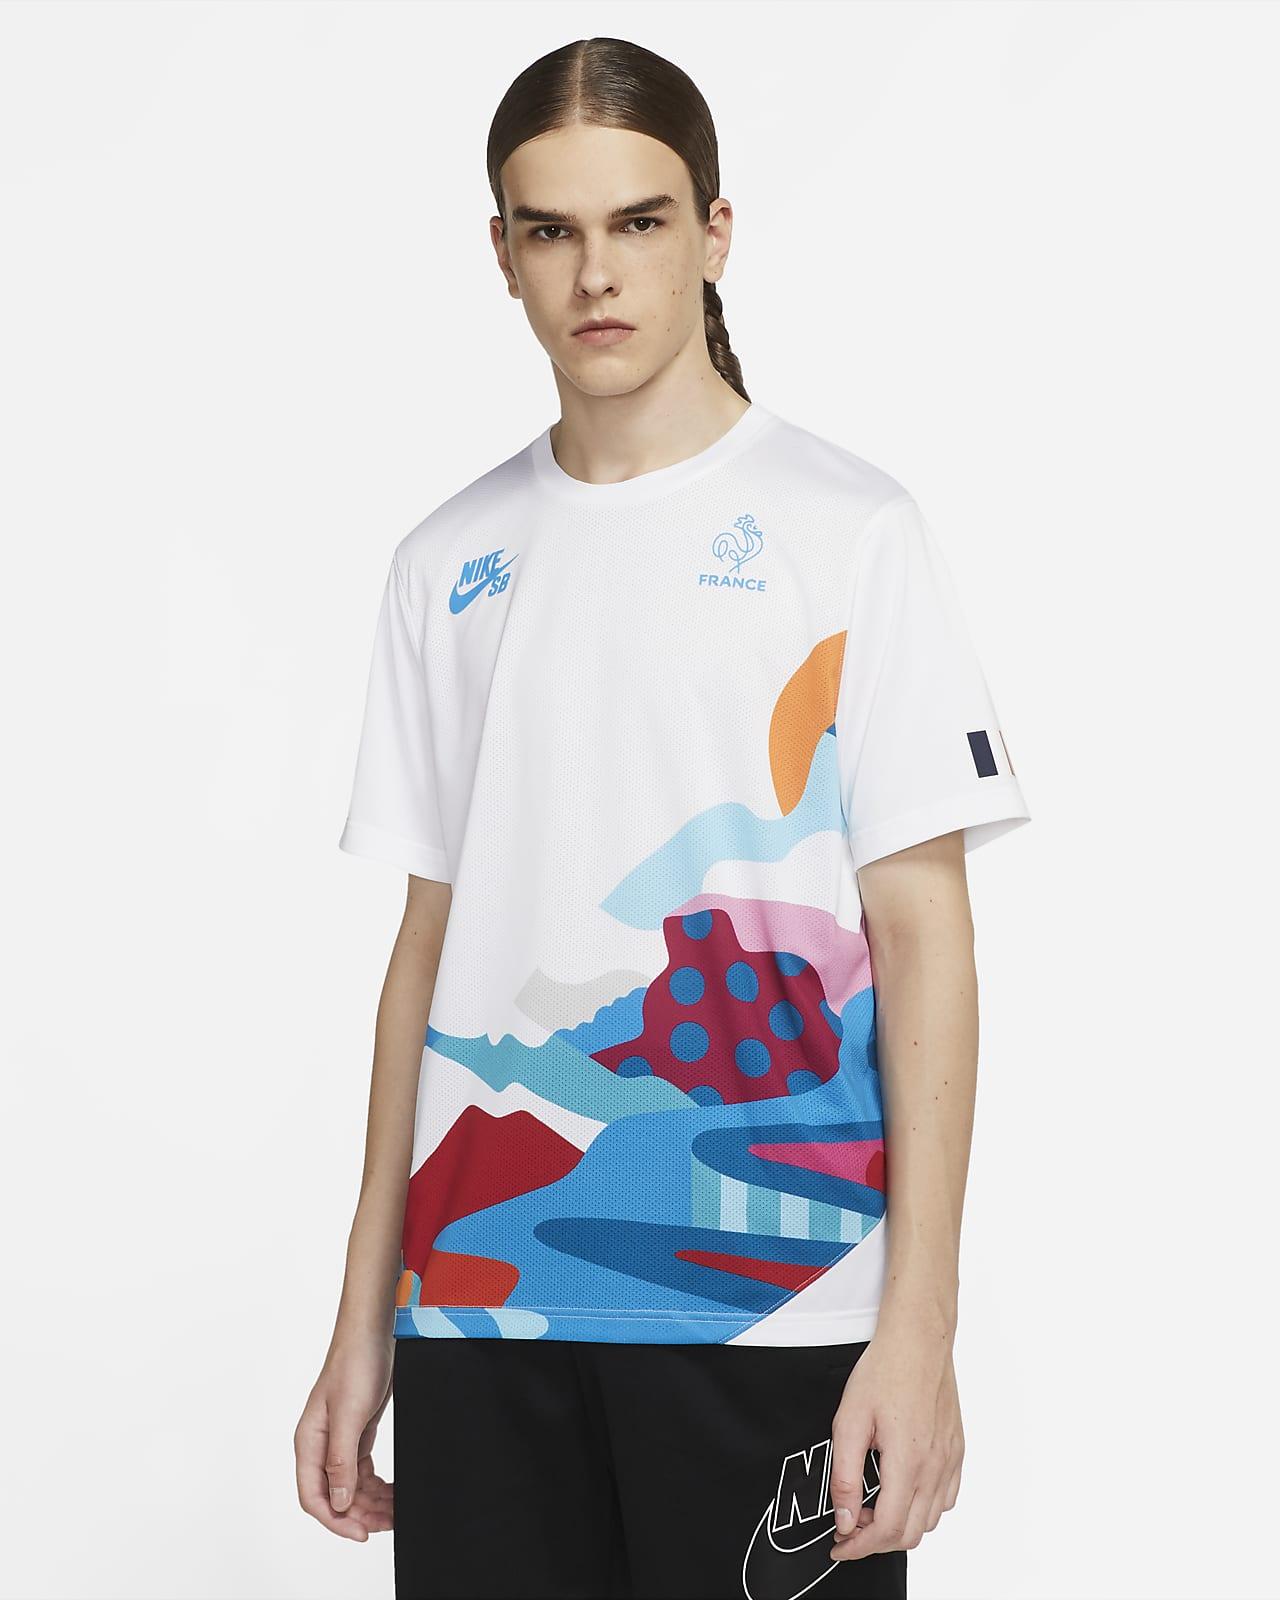 Nike SB France 男子滑板上衣